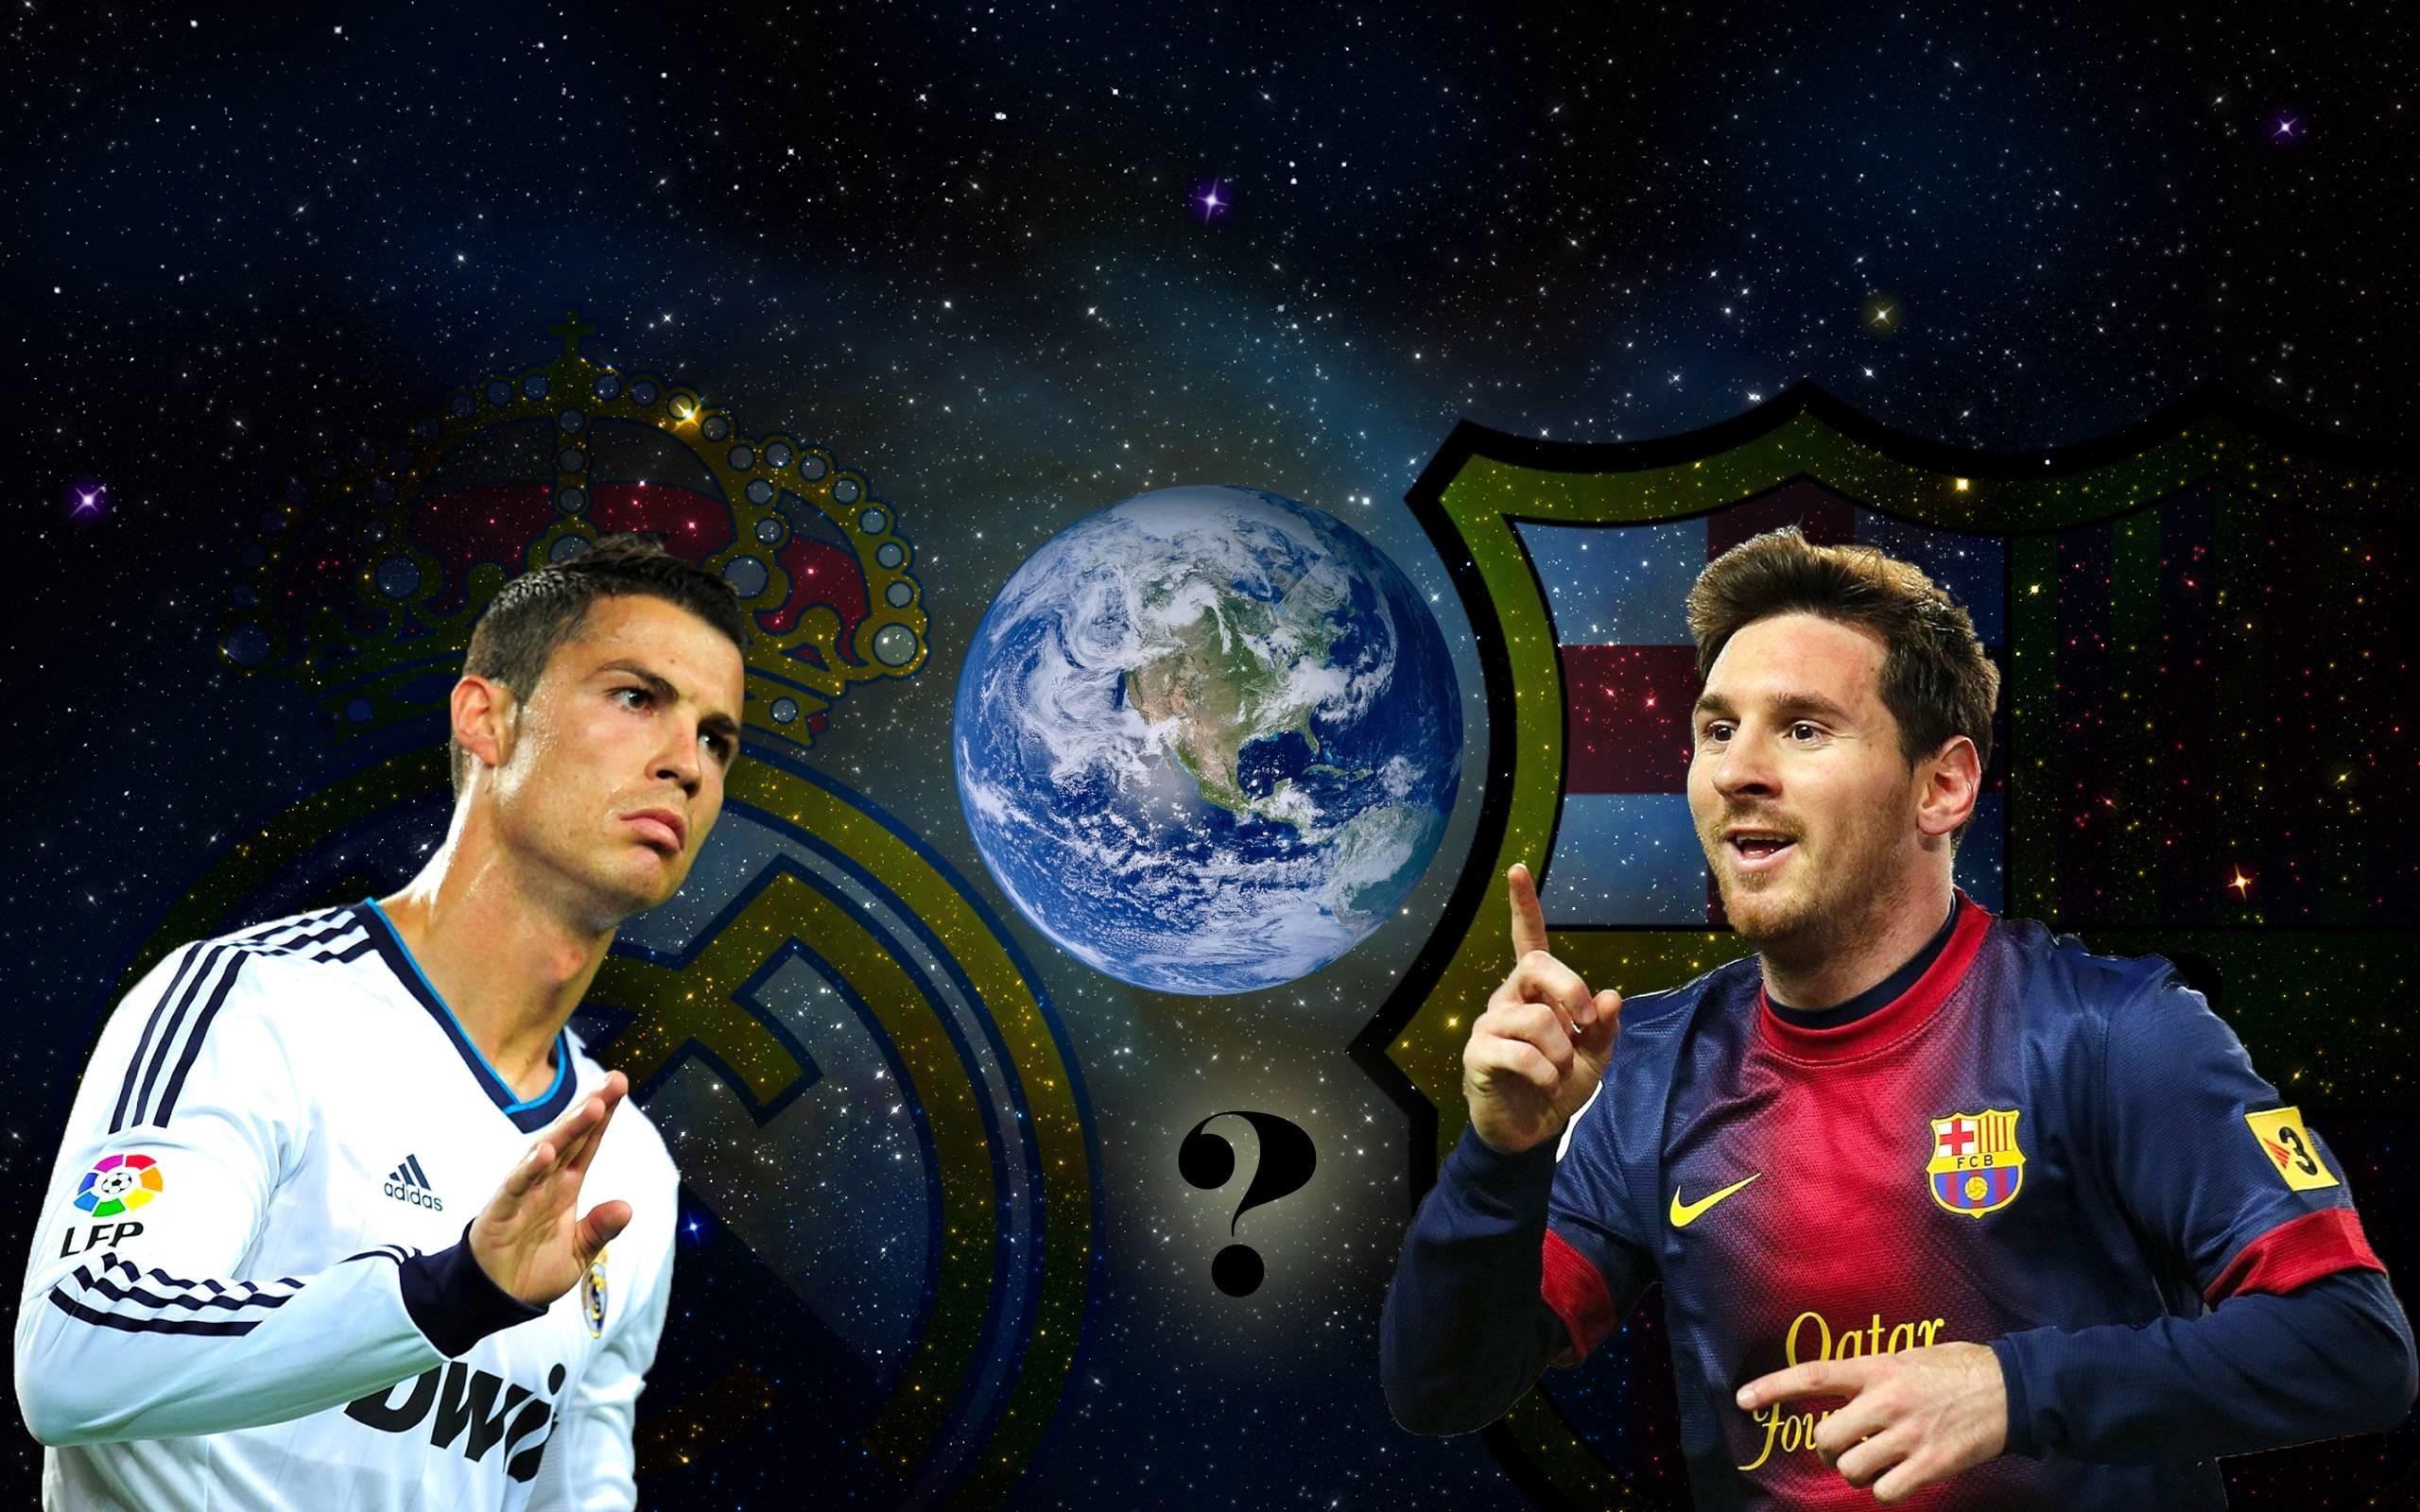 Ronaldo vs Messi wallpaper – Cristiano Ronaldo Wallpapers